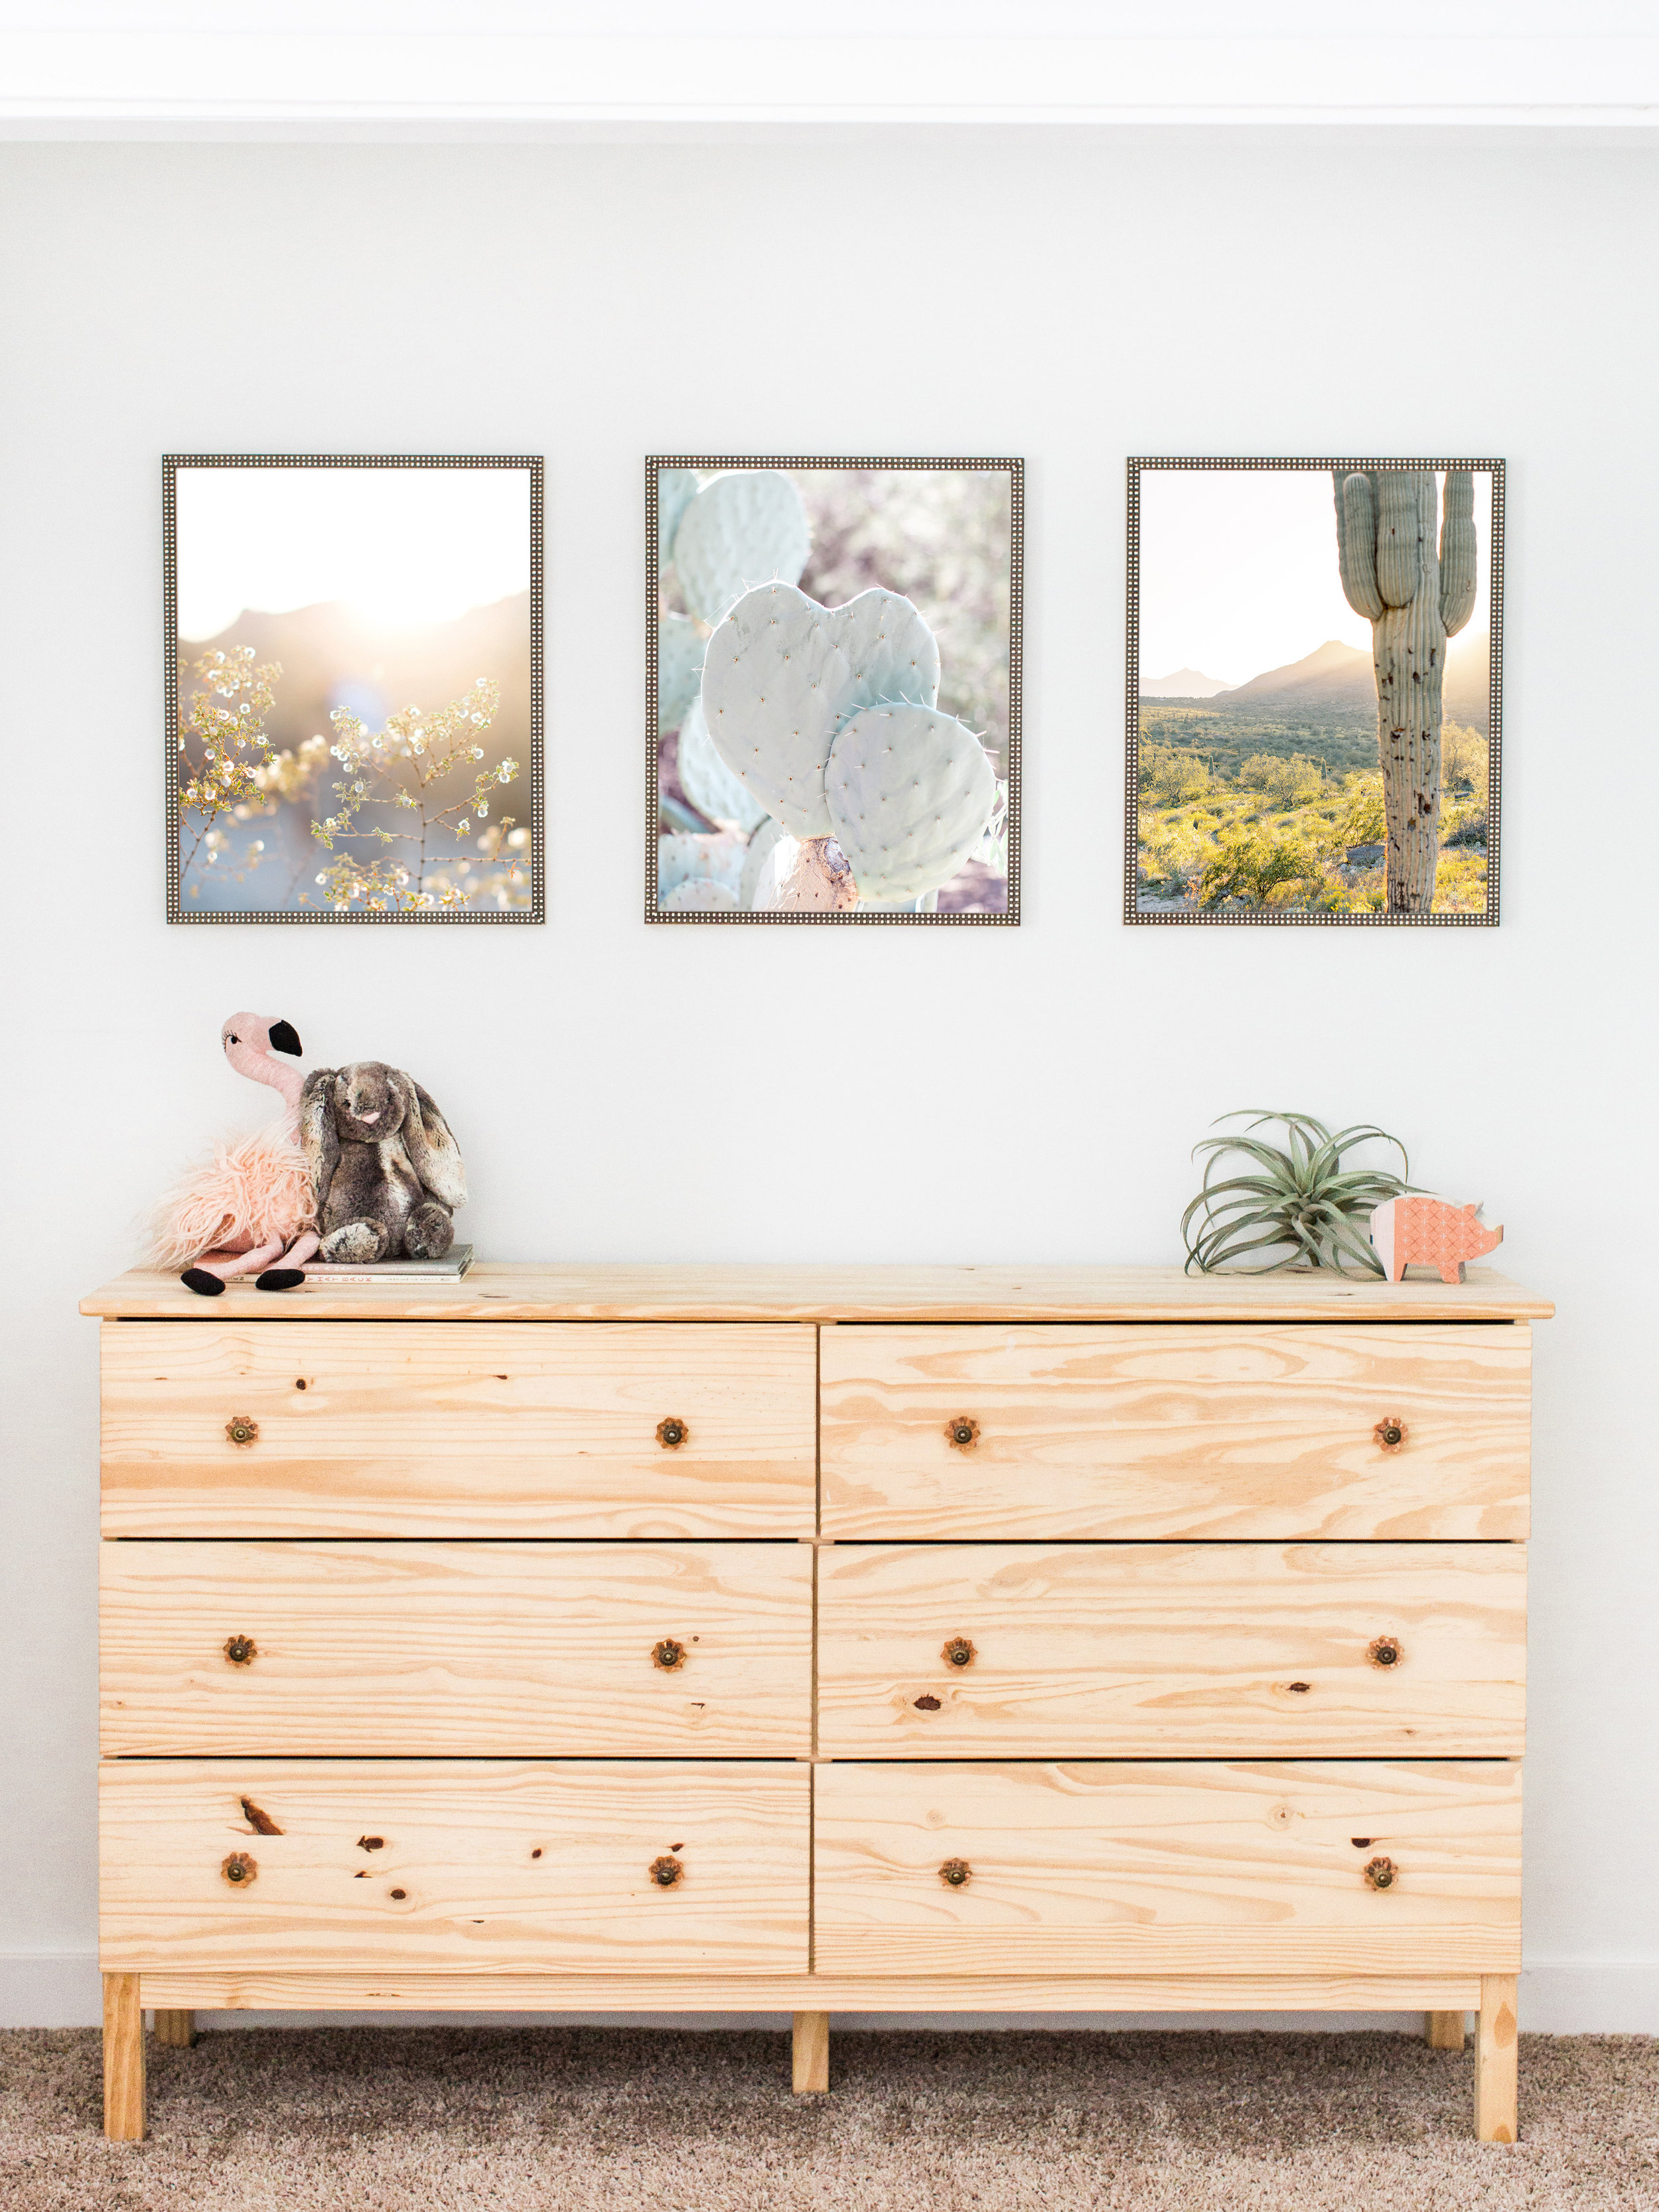 $99 - 16x20 Prints (set of 3)